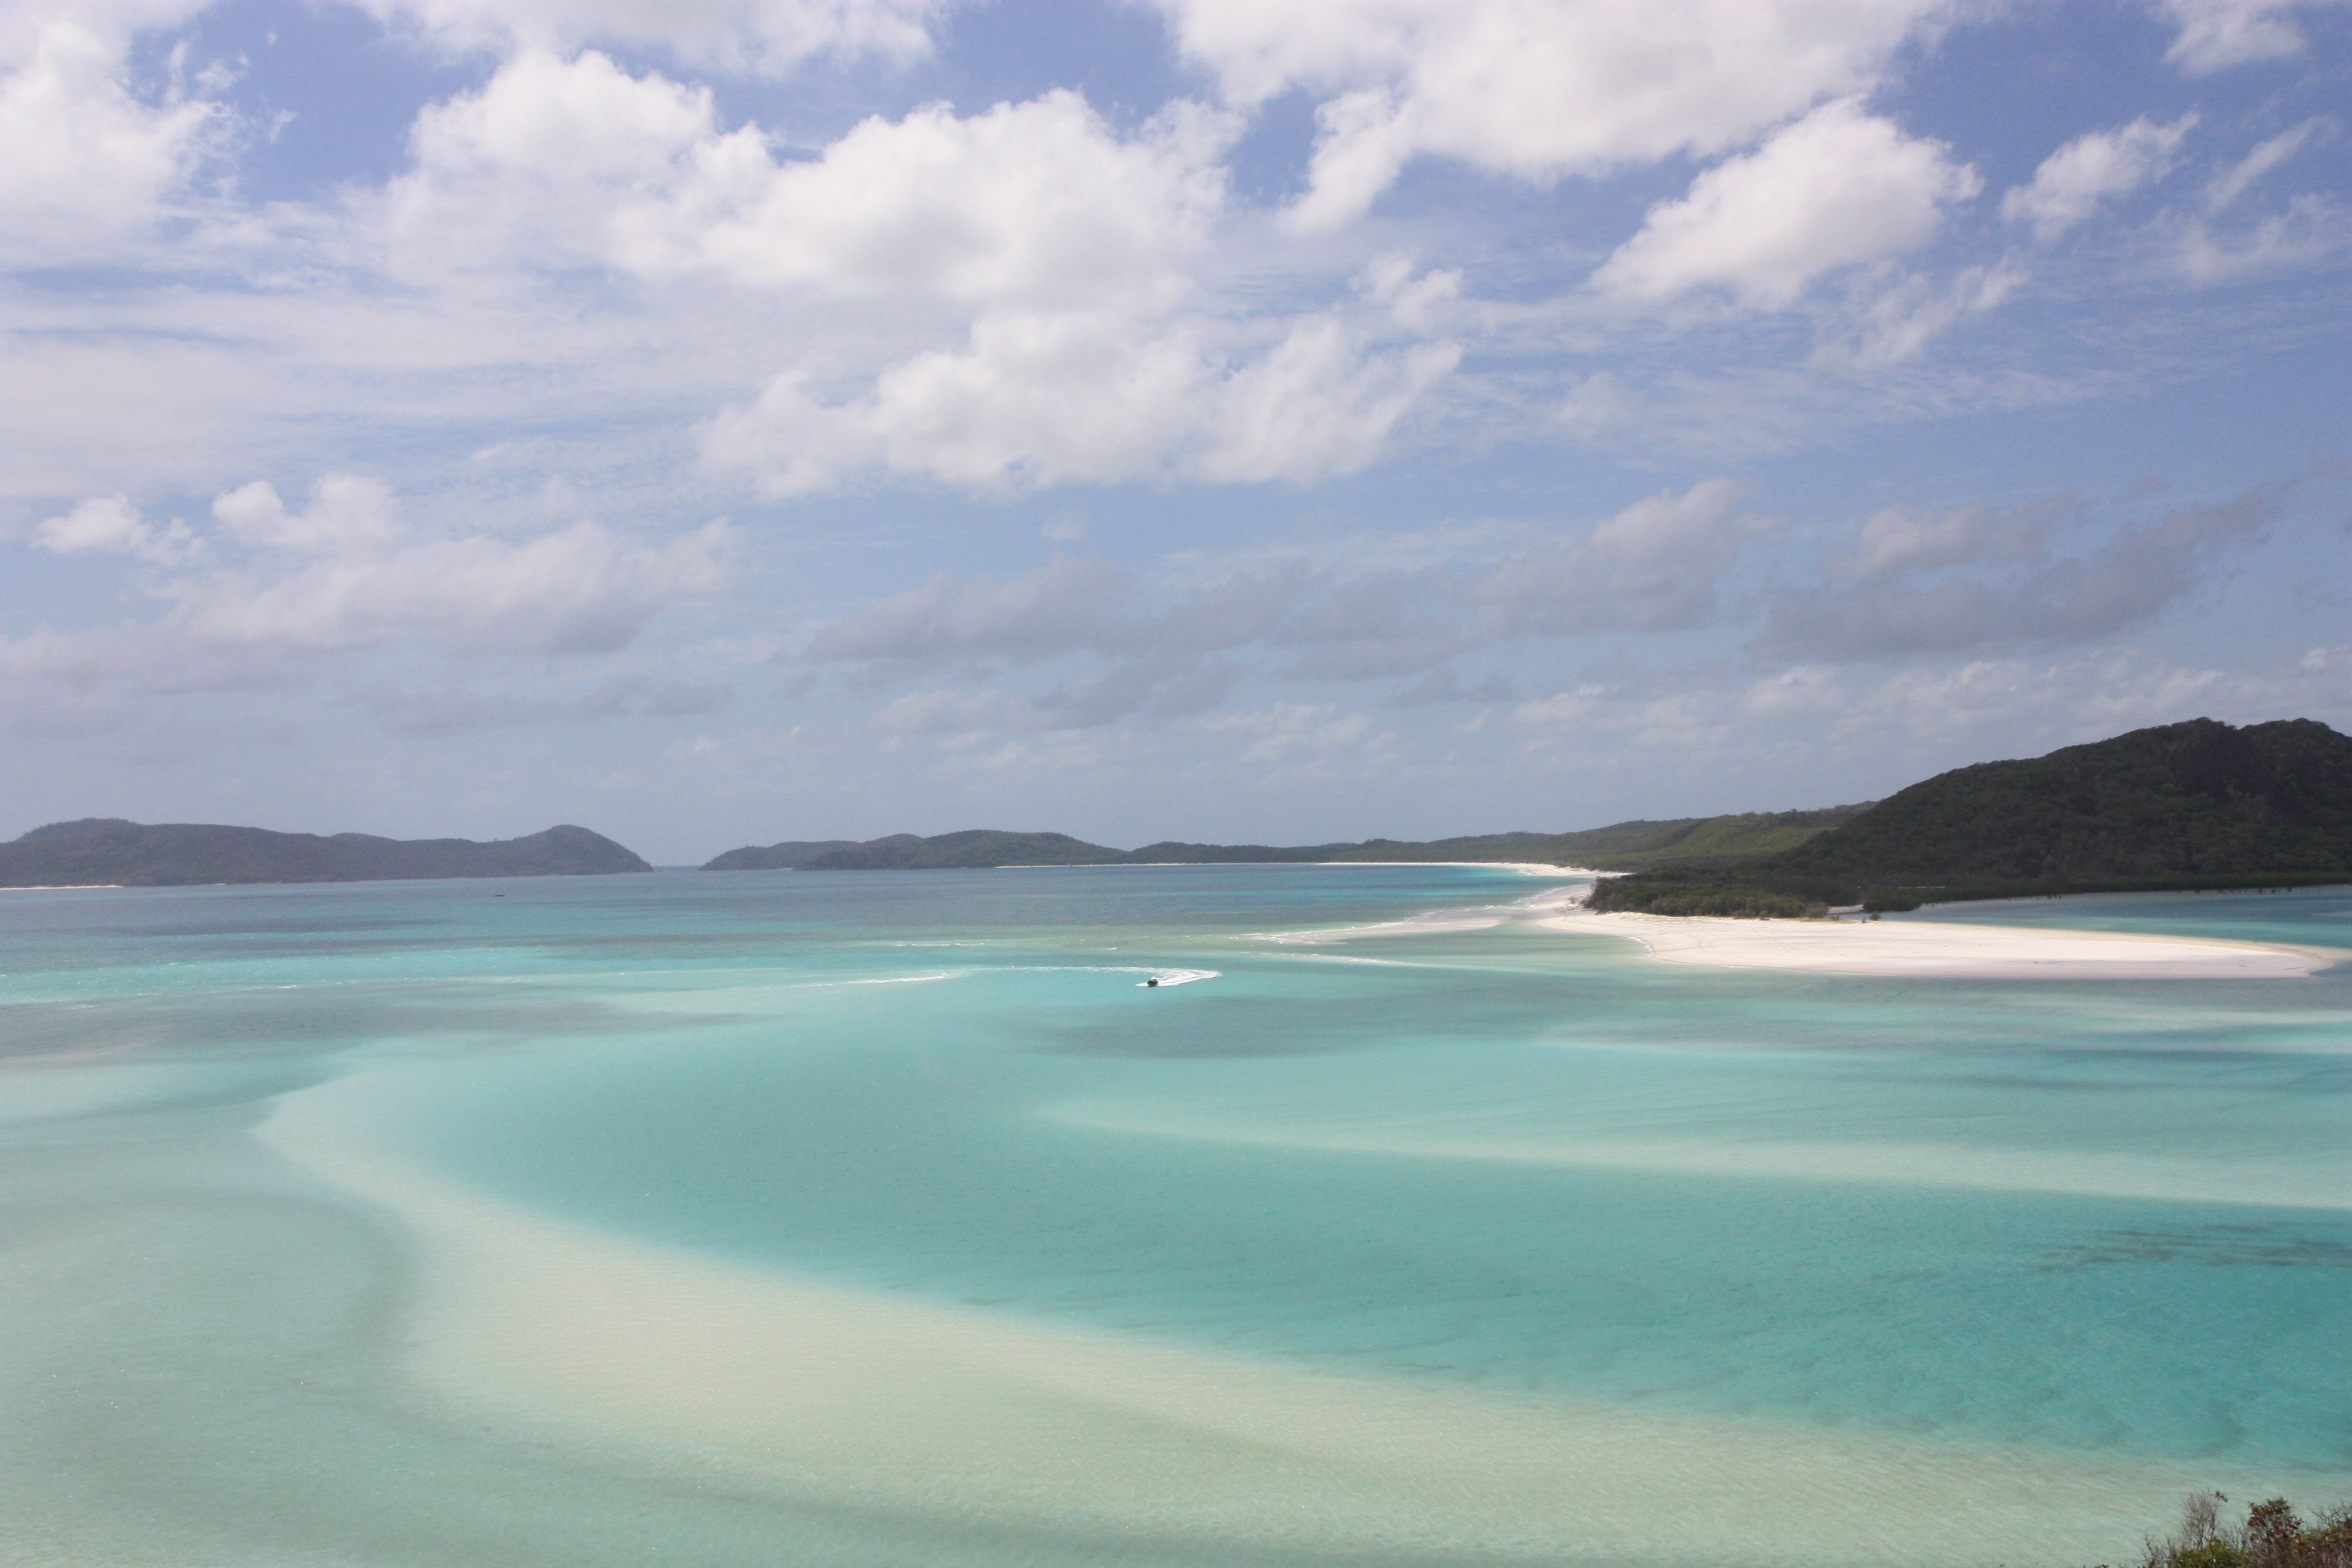 #Whitsundayisland #Australien #Strandurlaub #Reisetipps #Reiseideen #Meer #Pfingstsonntagsinseln #Queensland